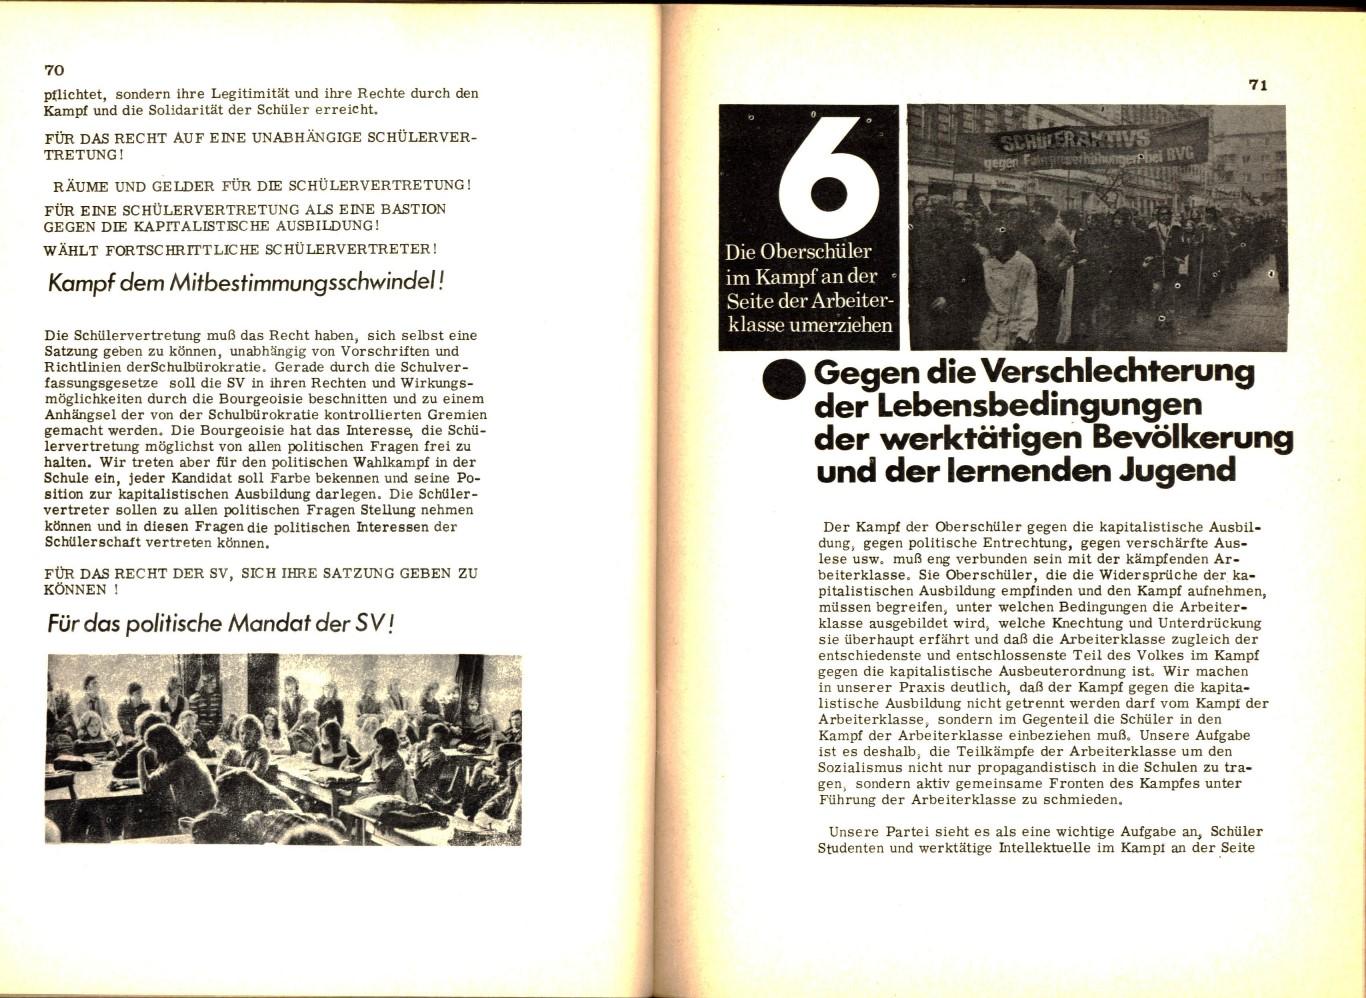 KOV_1973_Aktionsprogramm_38